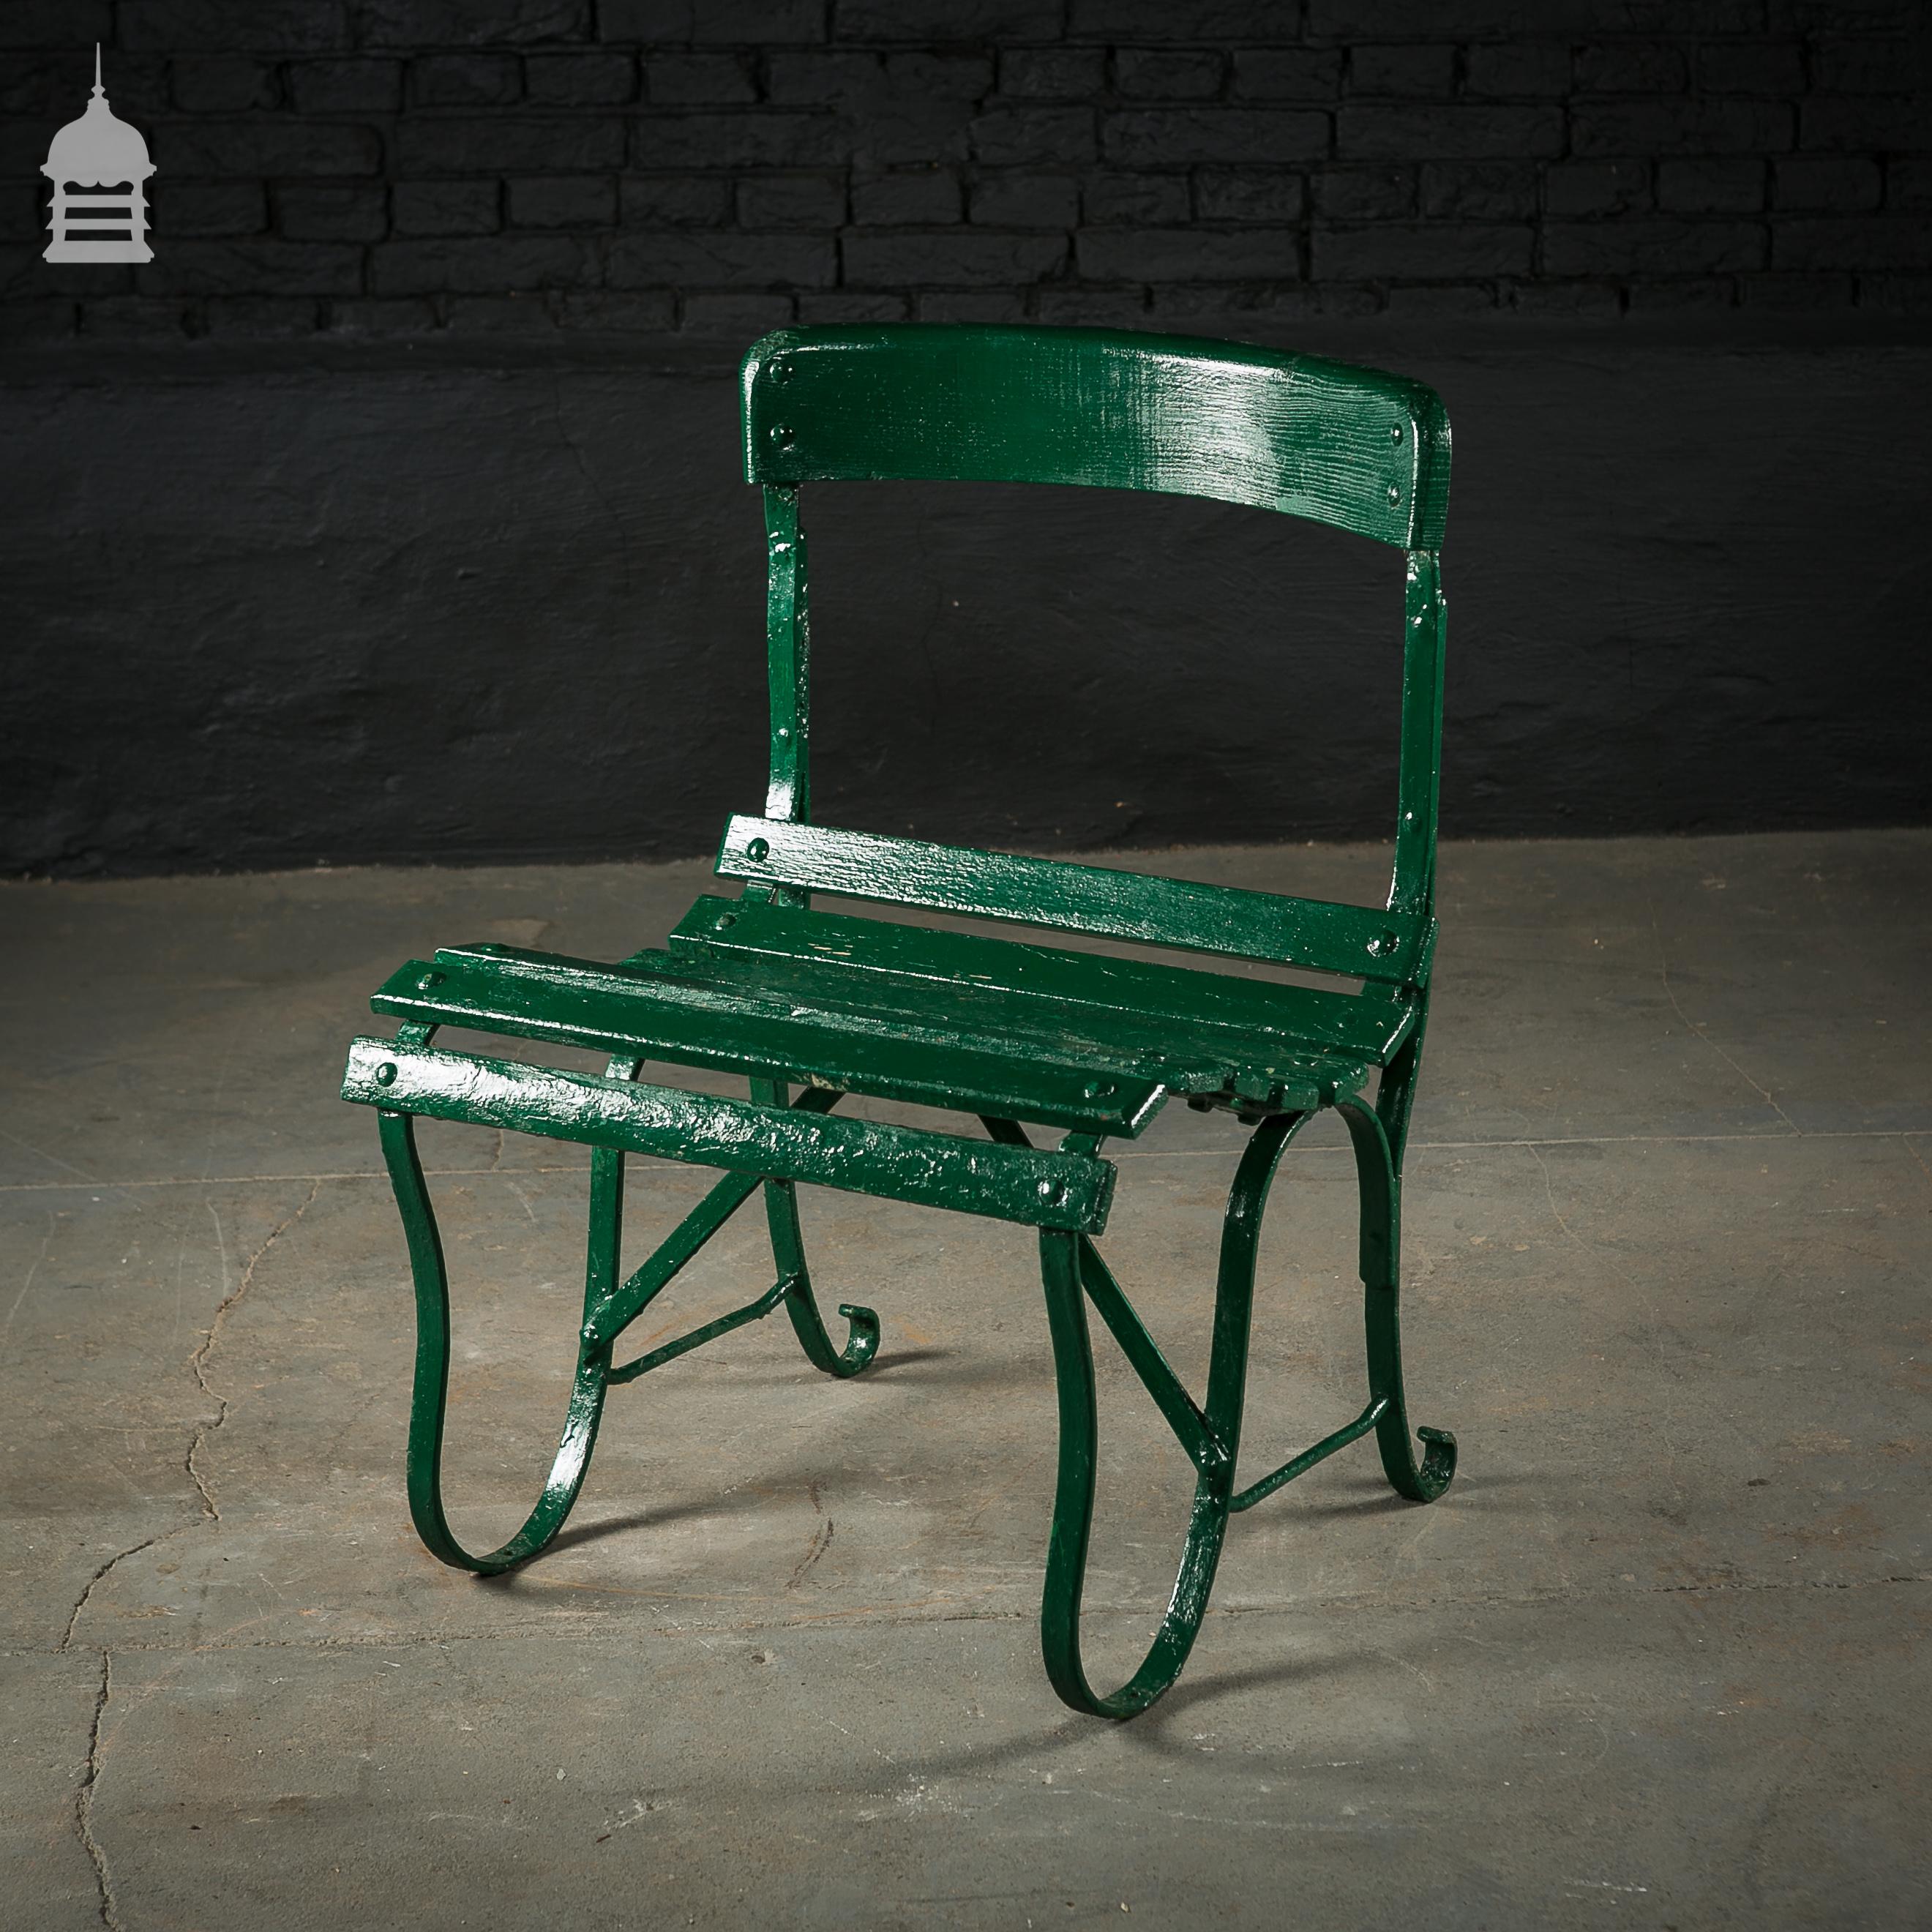 4 Wrought Iron Garden Chairs with Hardwood Slats 3